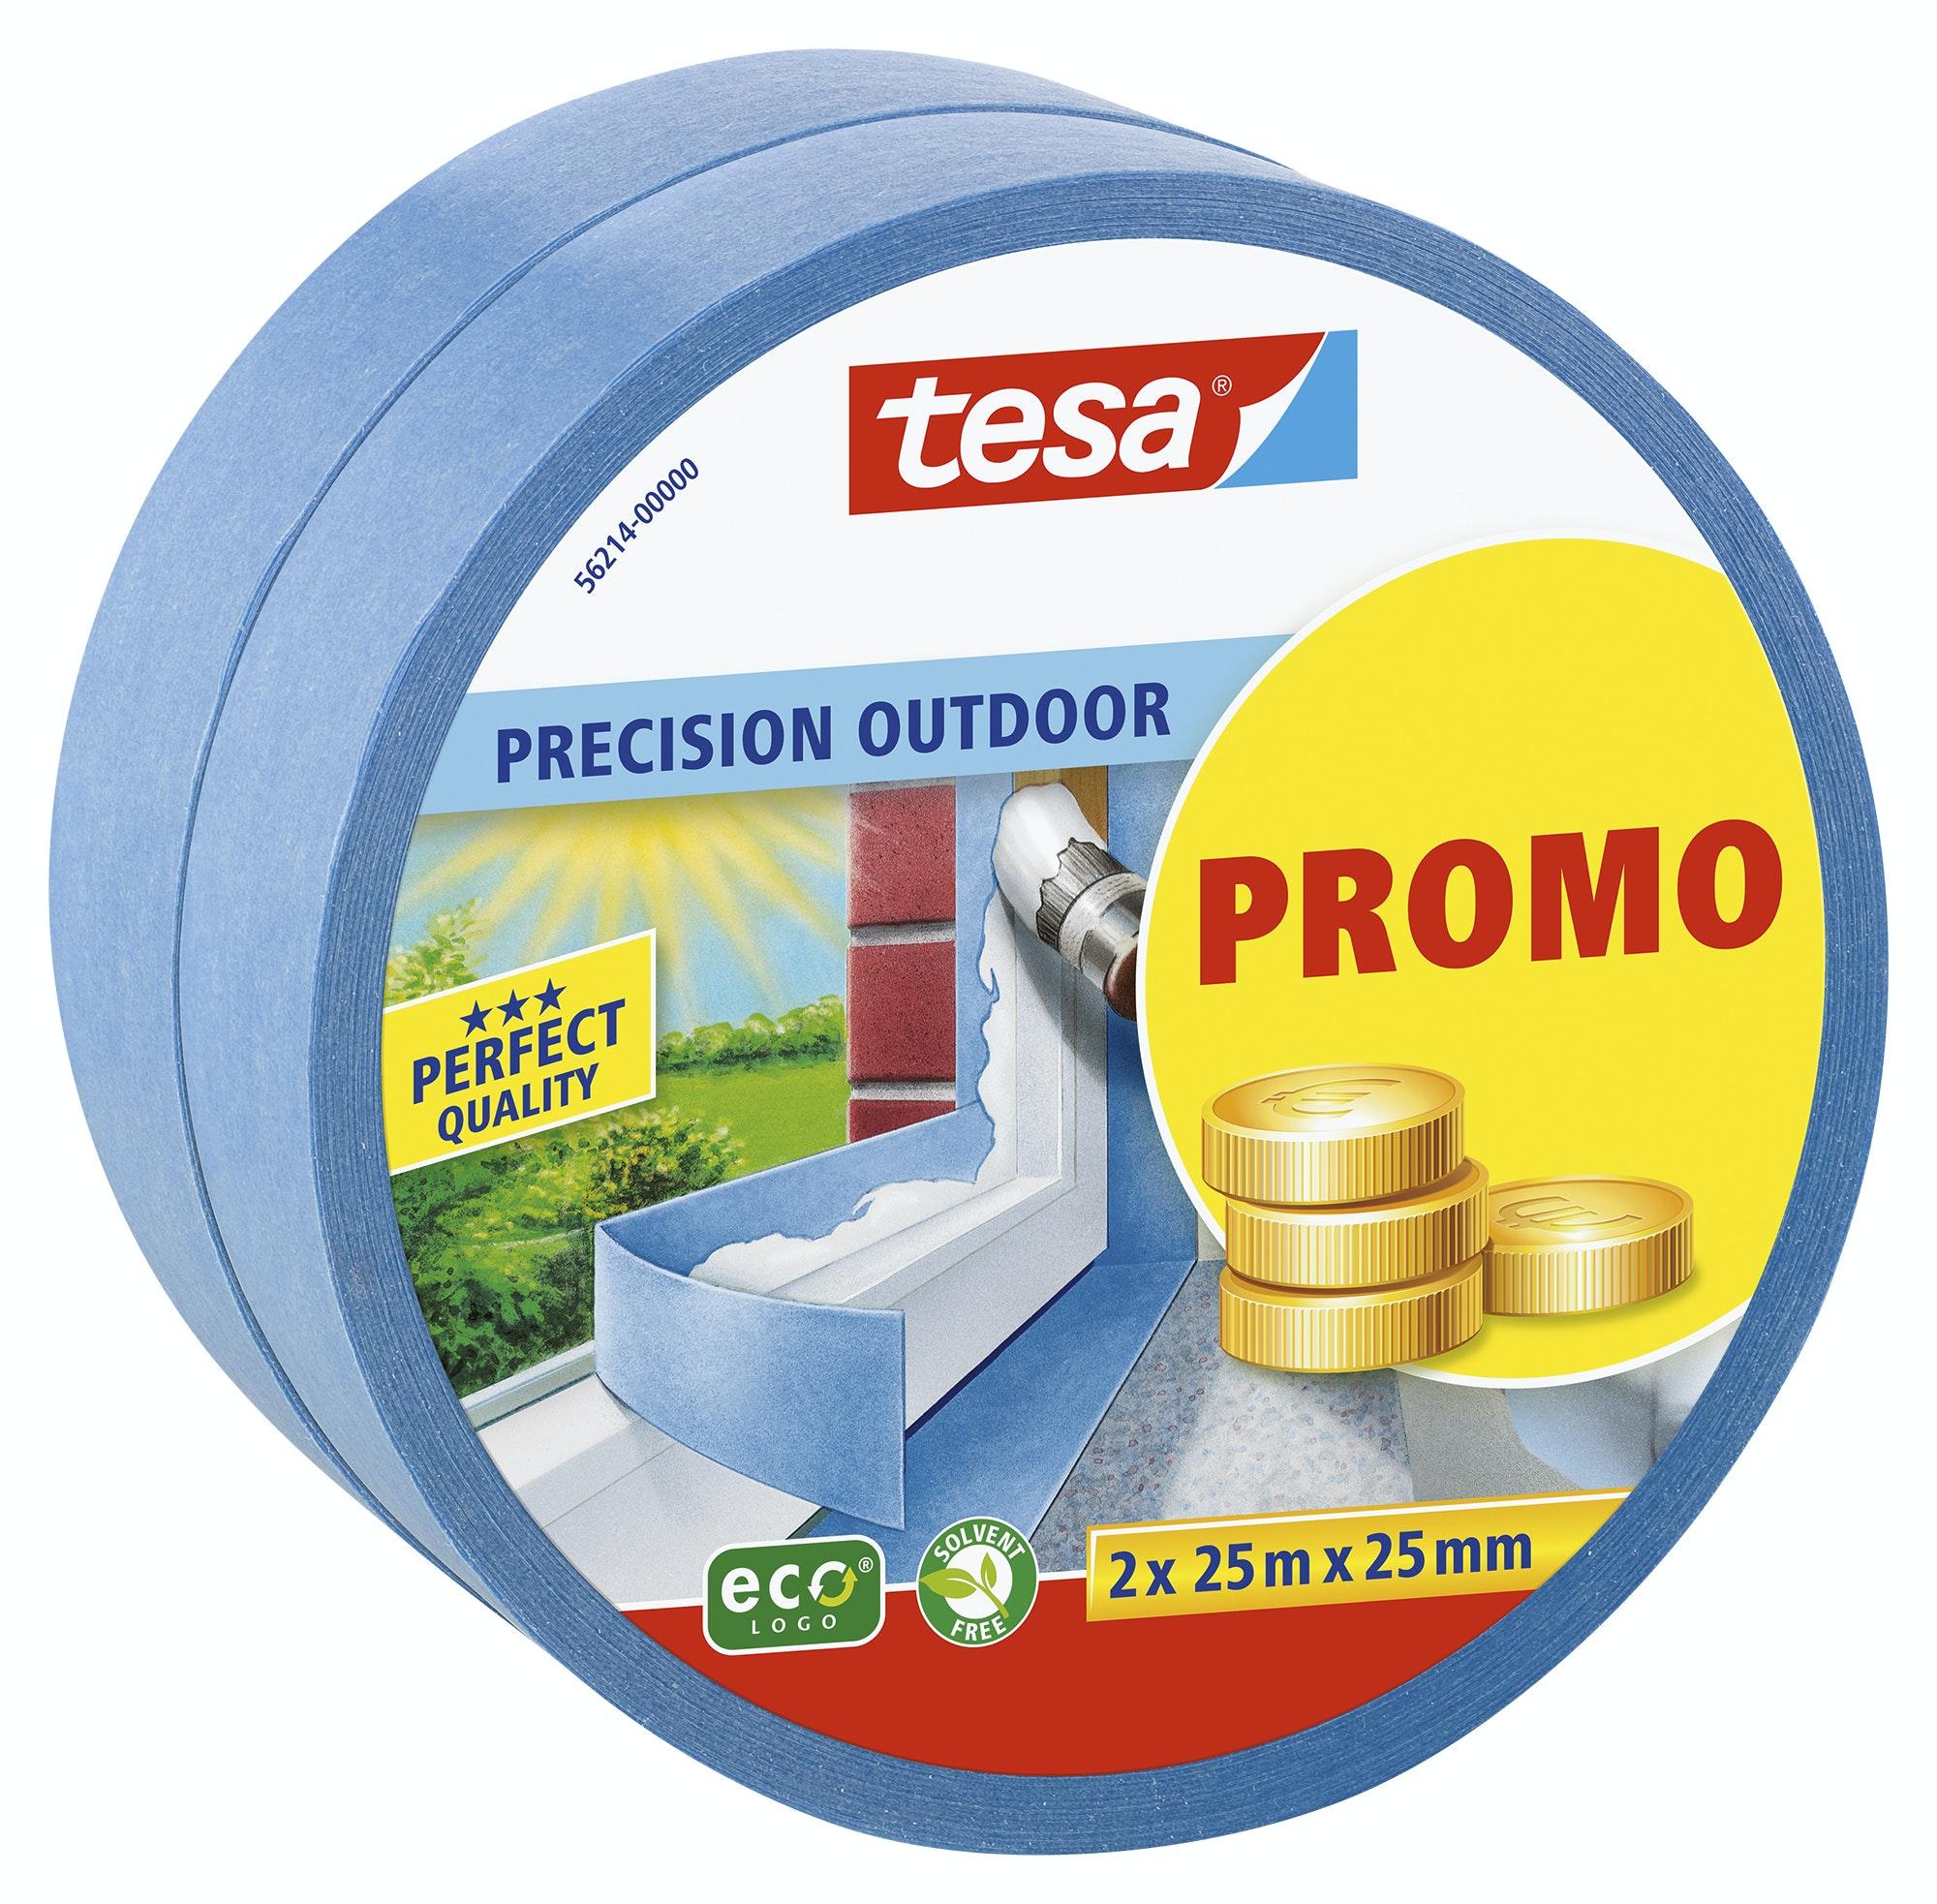 Maskeringstejp Tesa Precision Outdoor Promo 2-Pack 2x25mmx25m